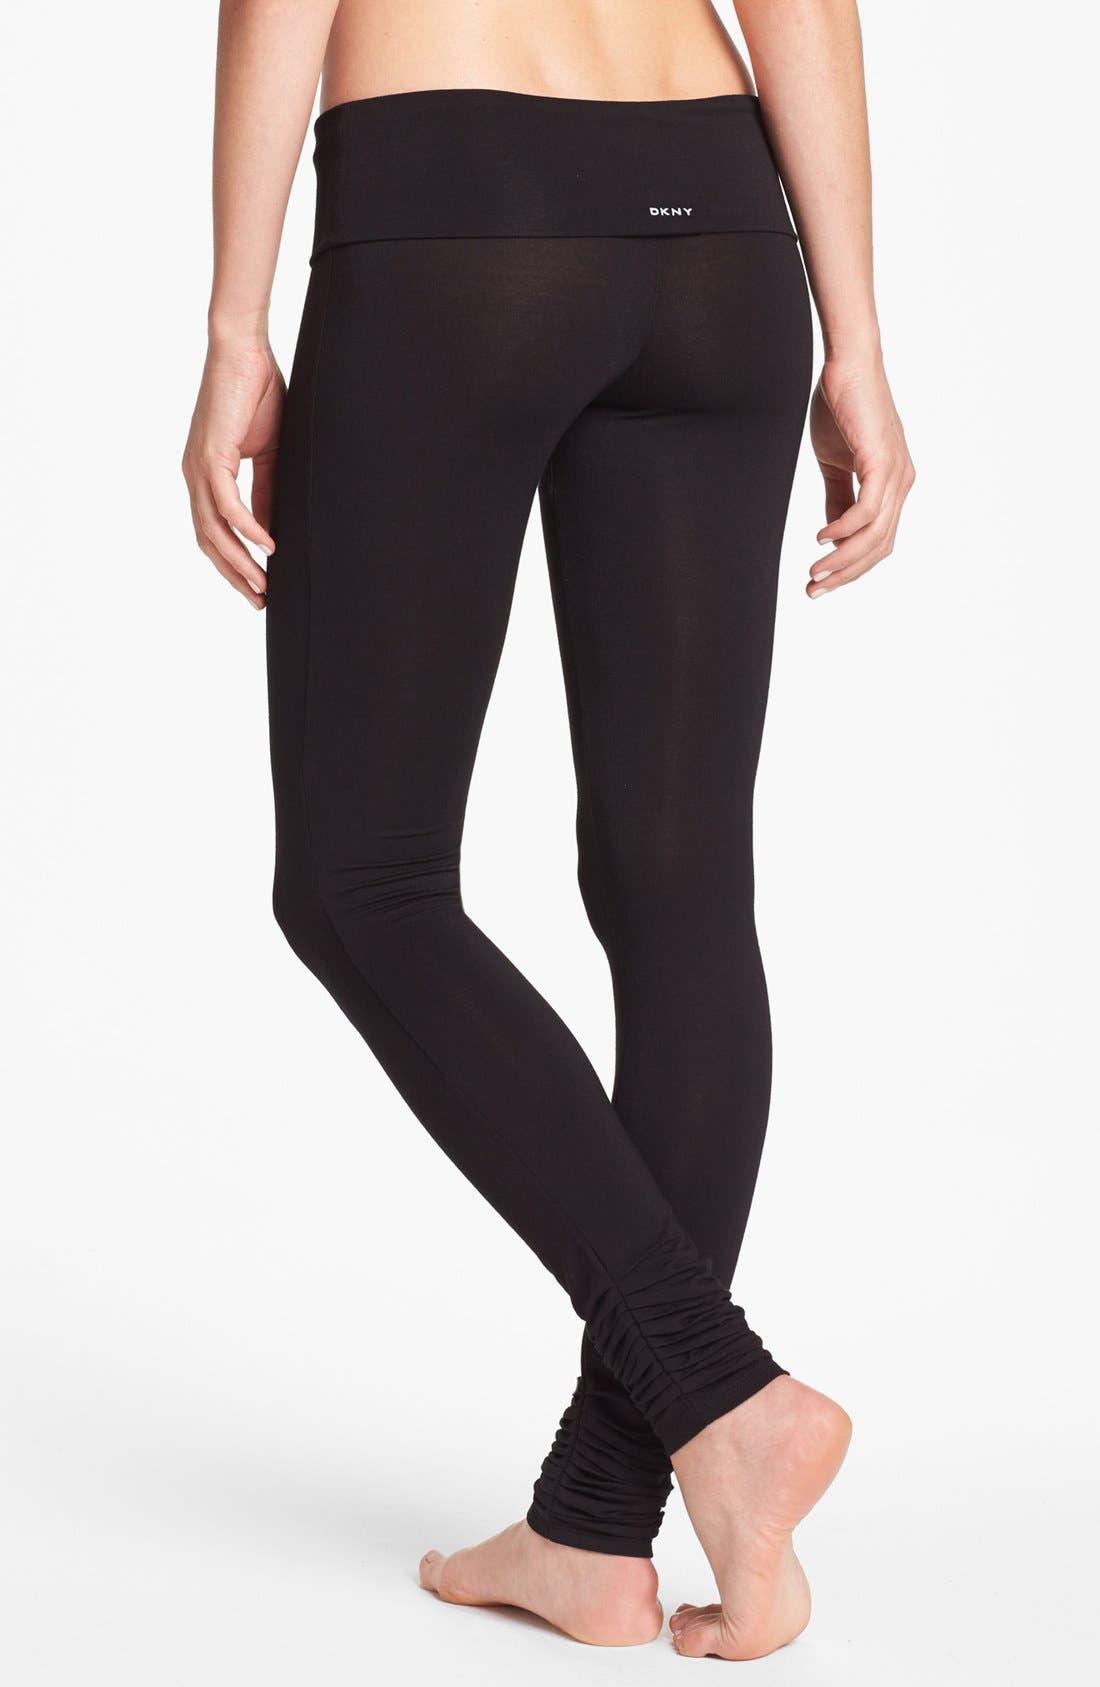 Alternate Image 2  - DKNY 'Soho Mews Yoga Skinnies' Leggings